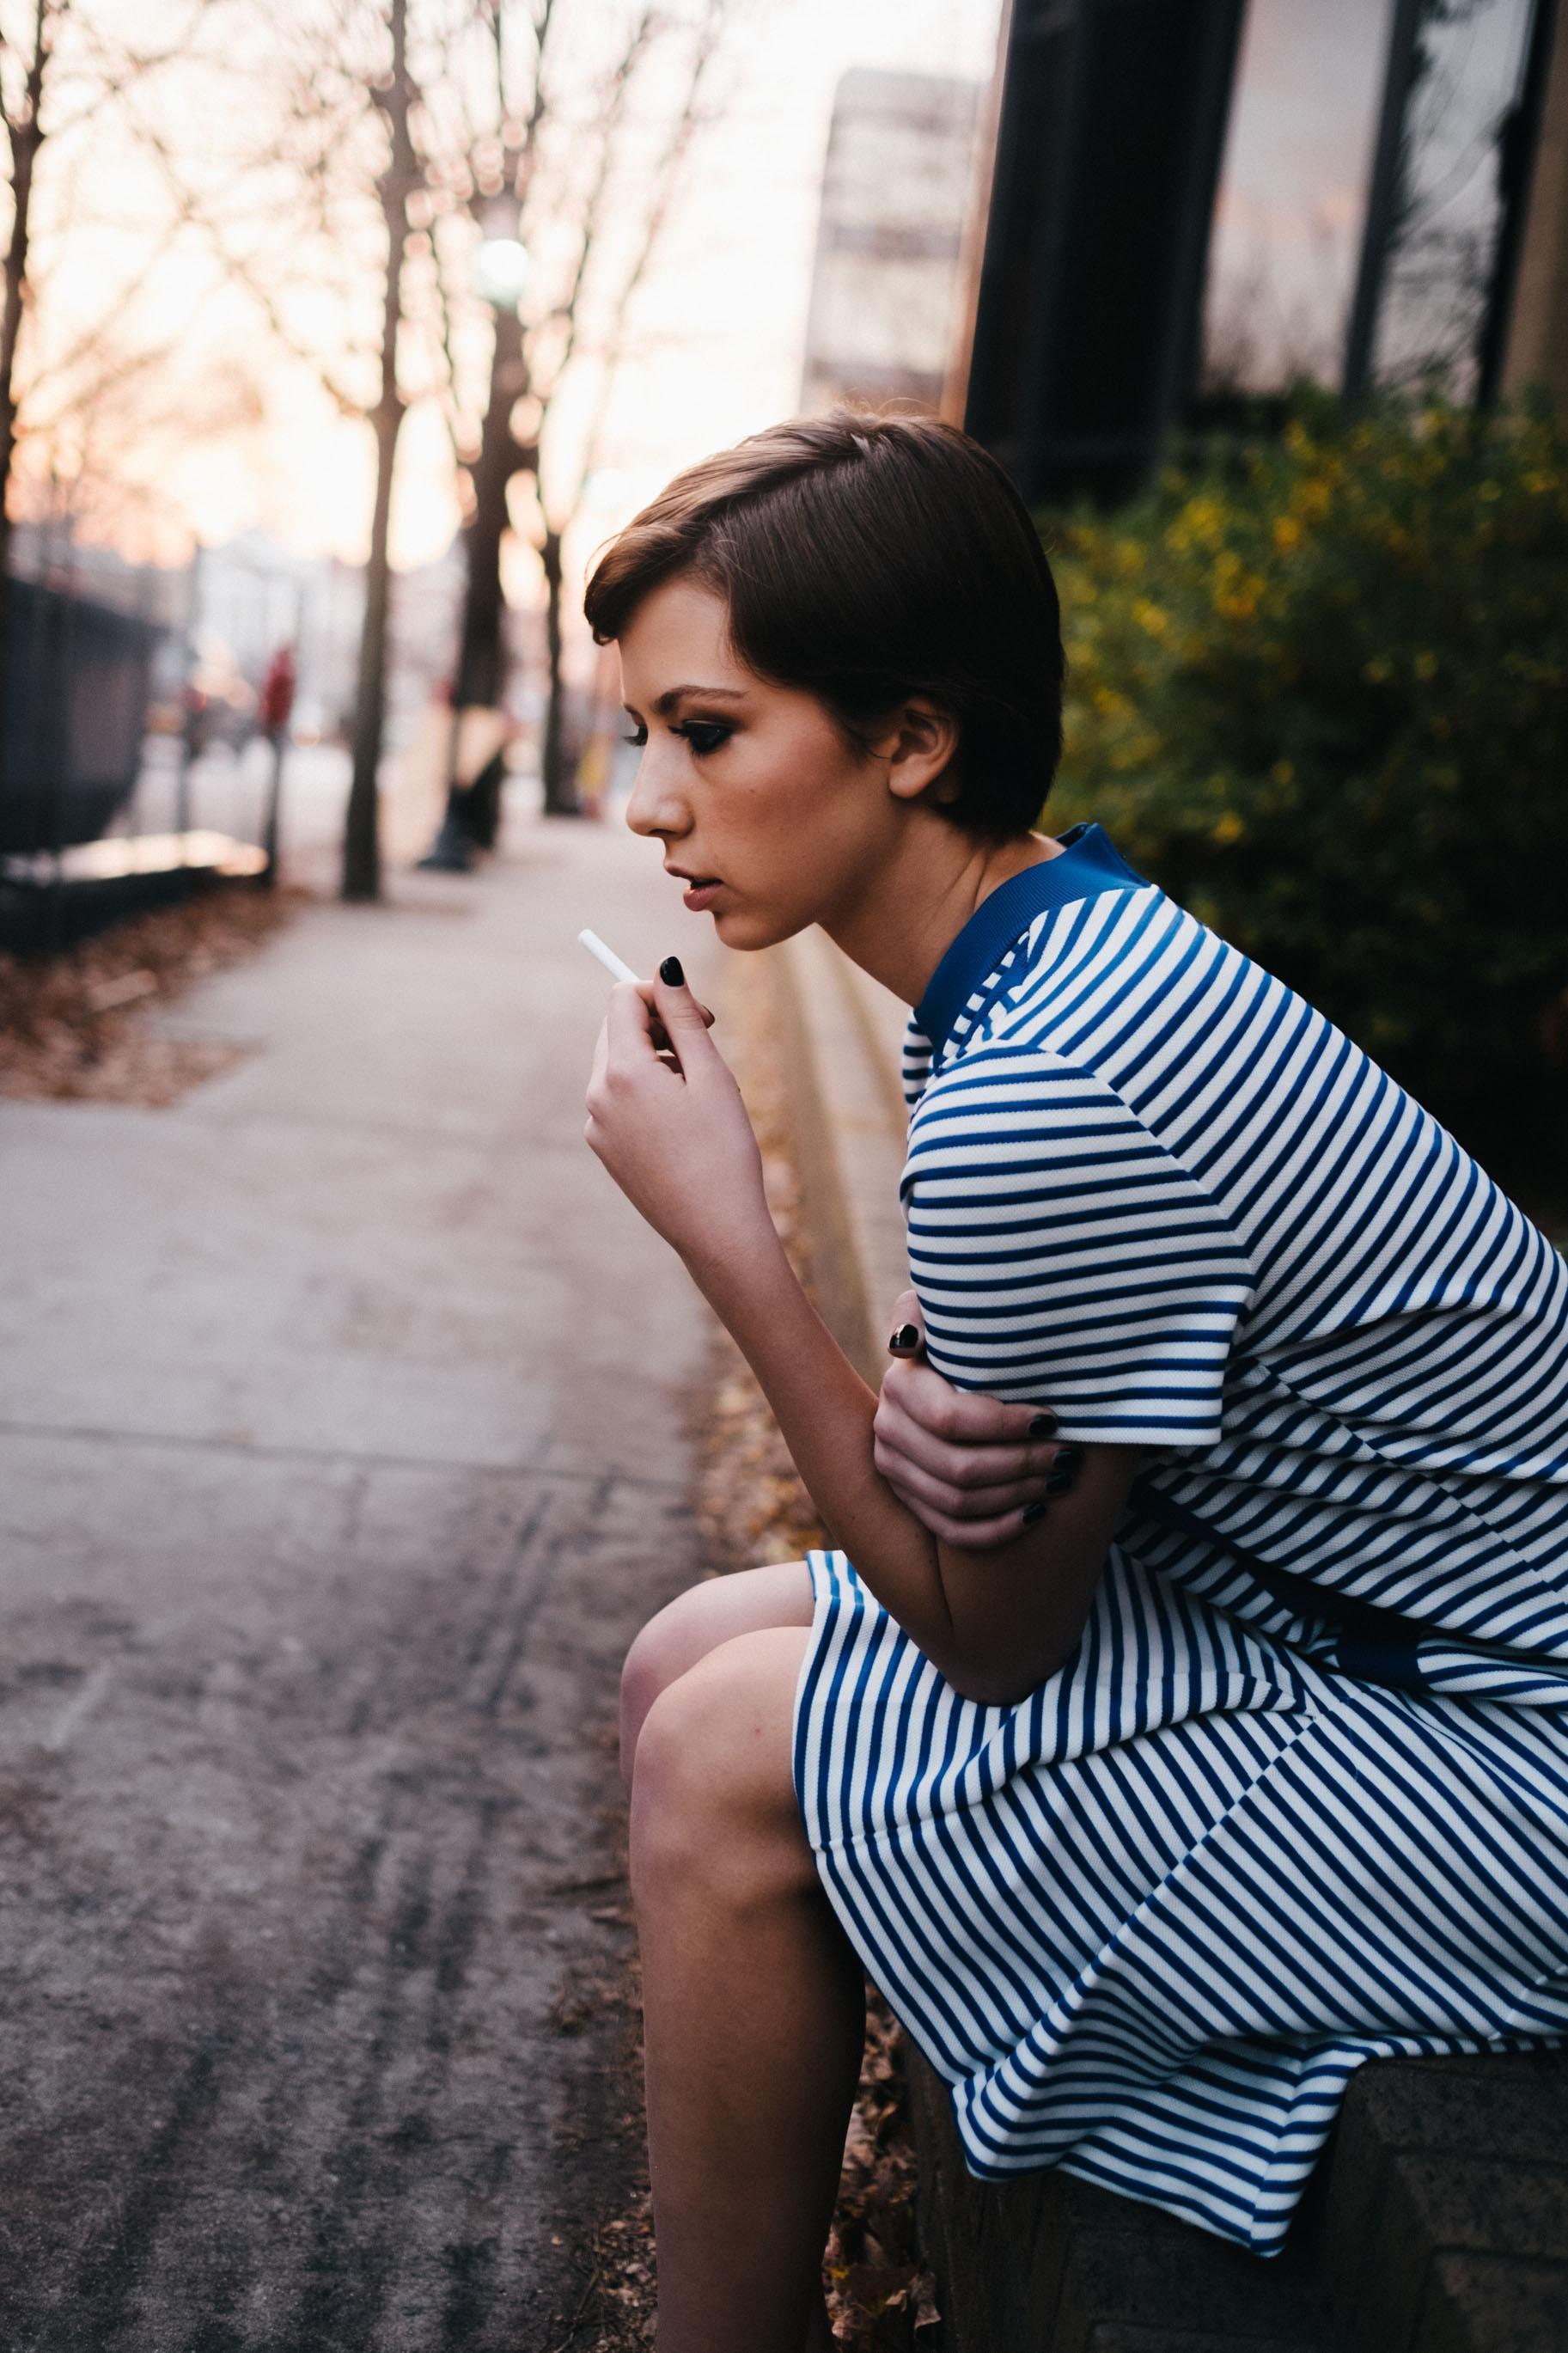 woman sitting down while smoking cigarette